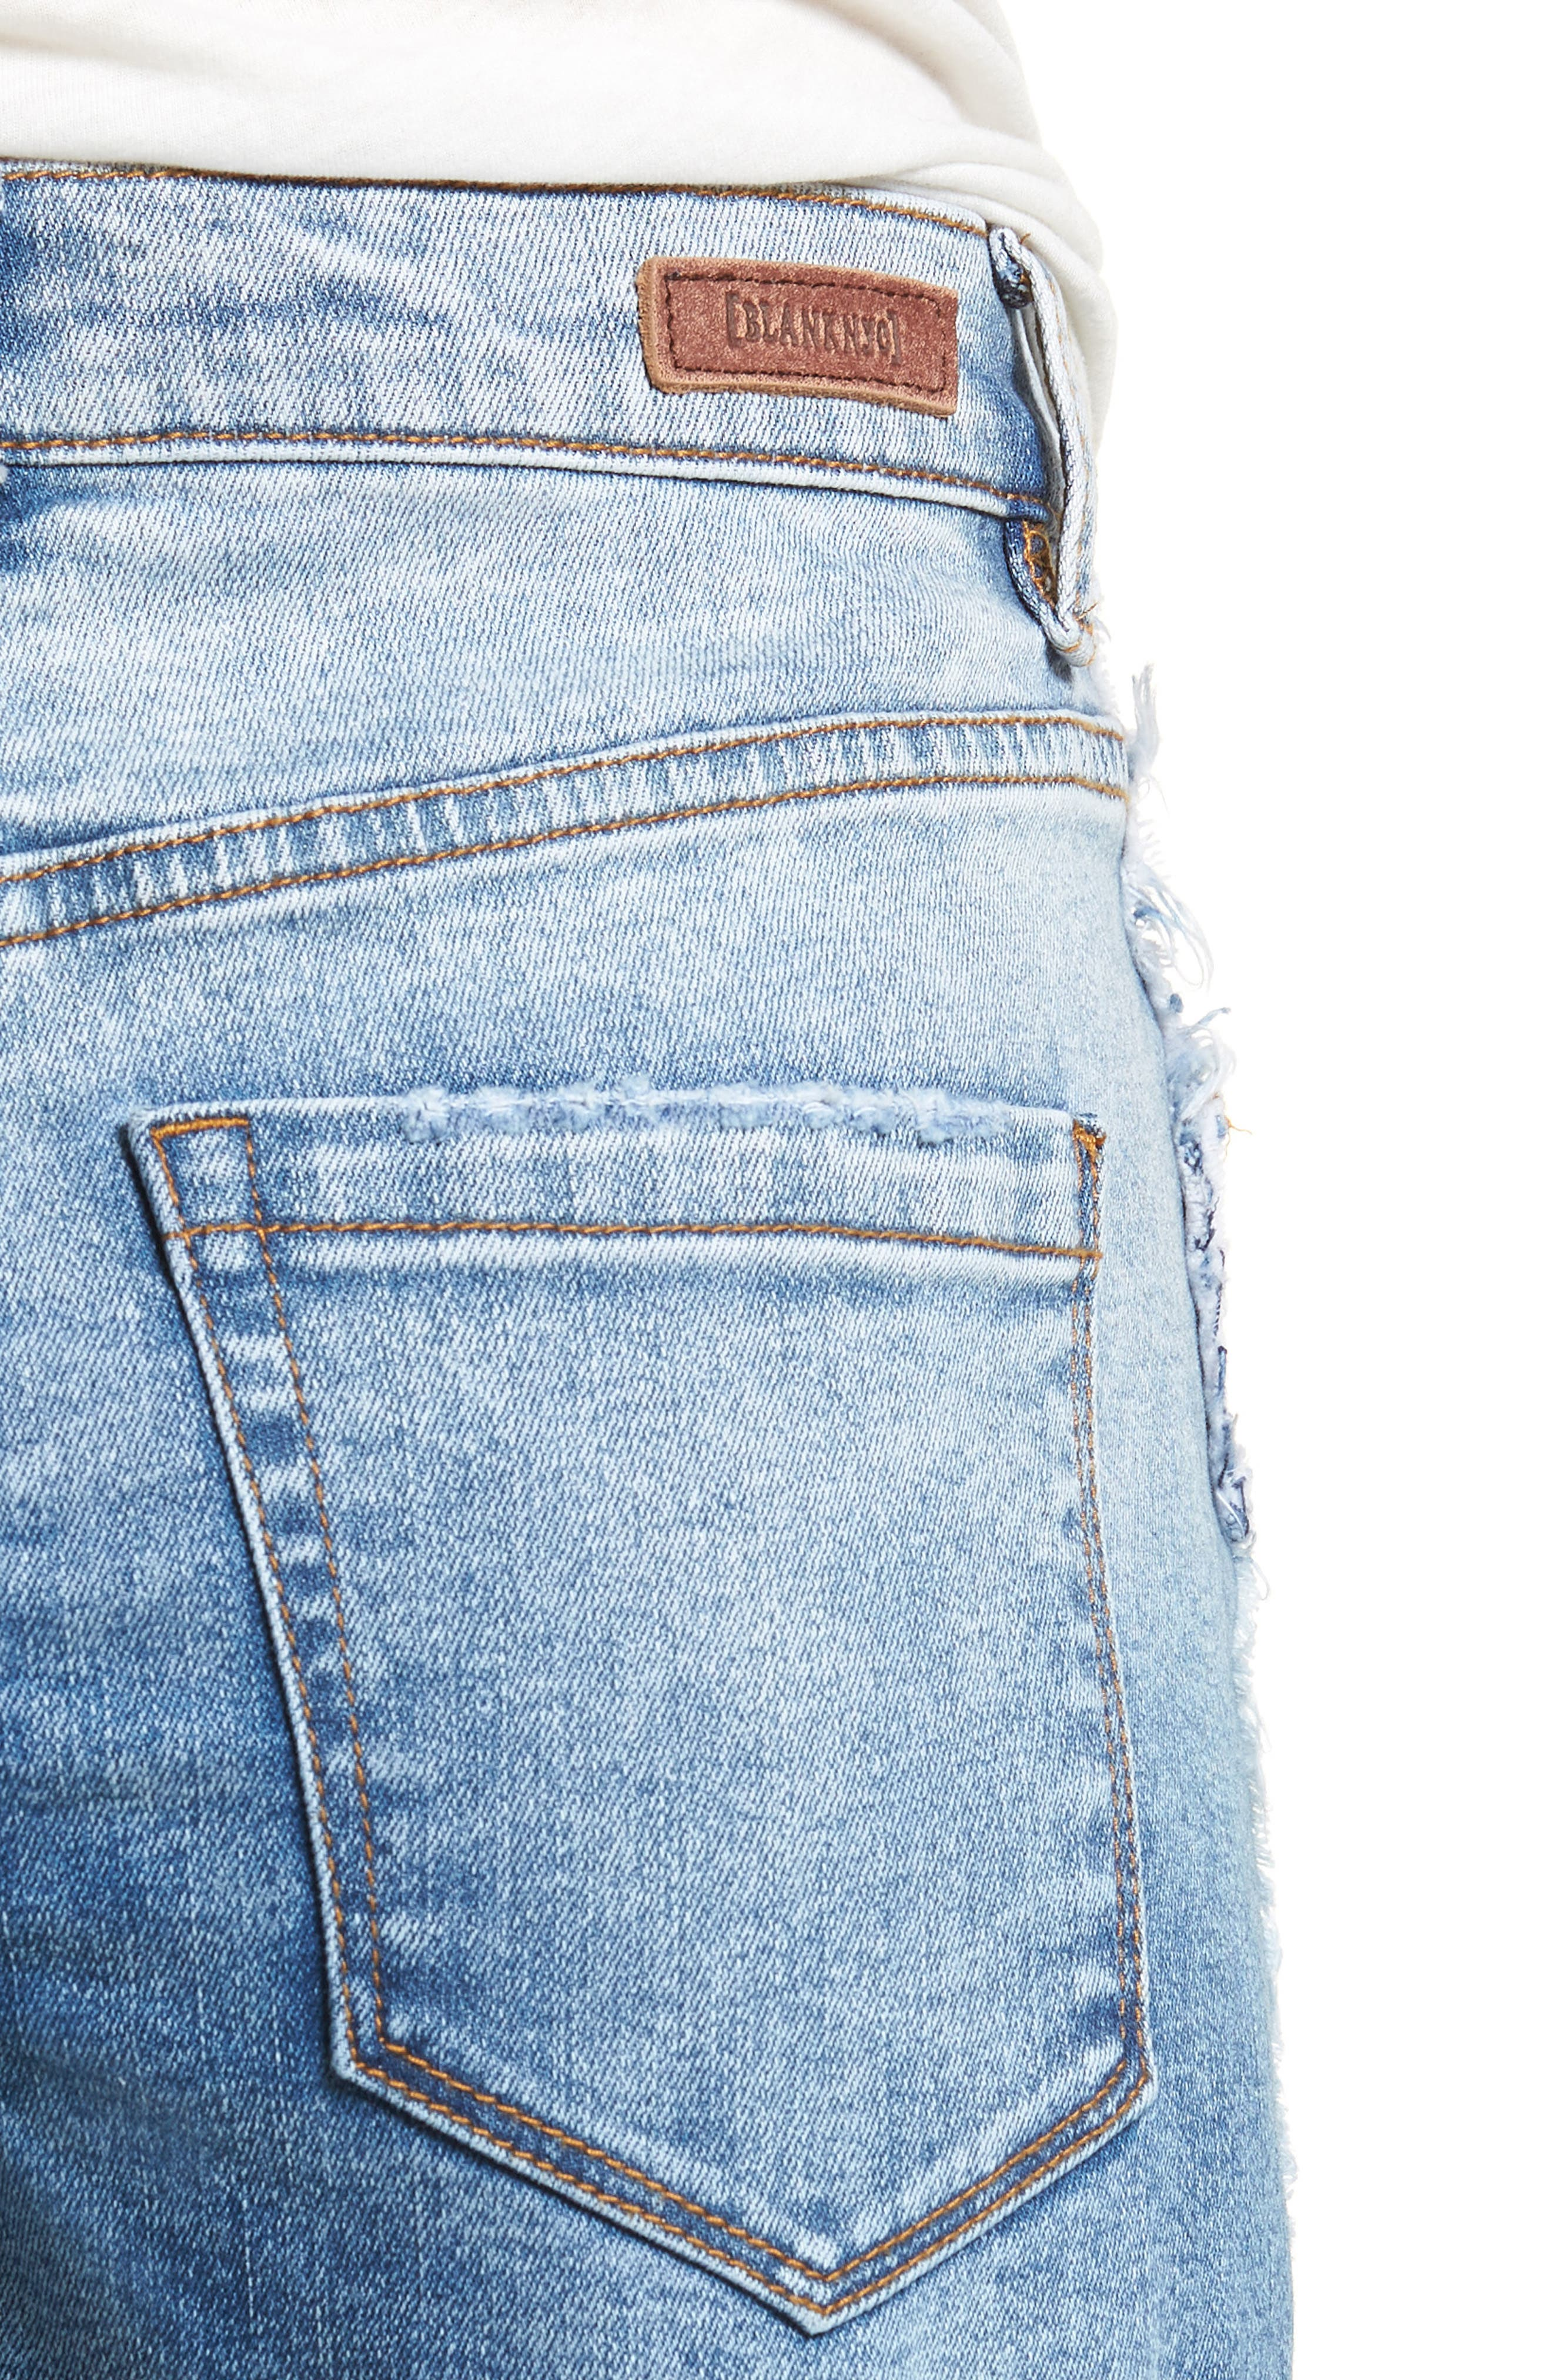 High Waist Cutoff Denim Shorts,                             Alternate thumbnail 4, color,                             Burn Notice